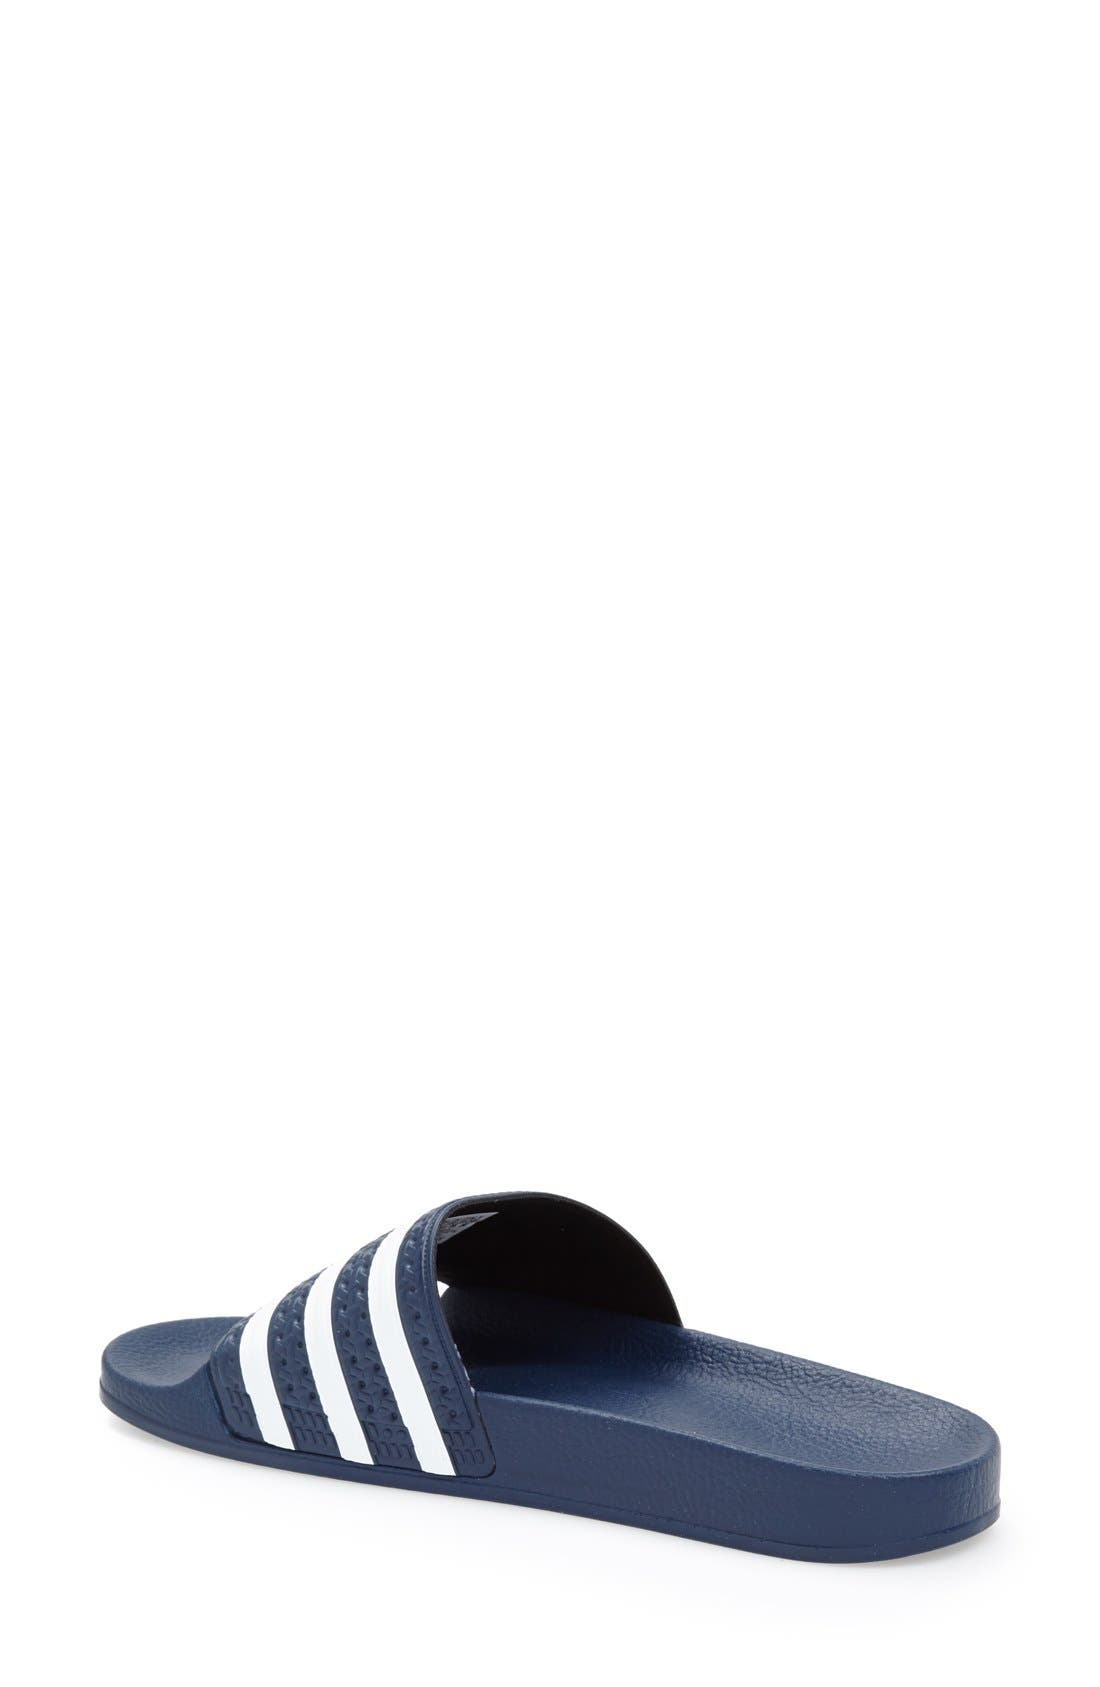 24bb2d27aa6f5 adidas Shoes